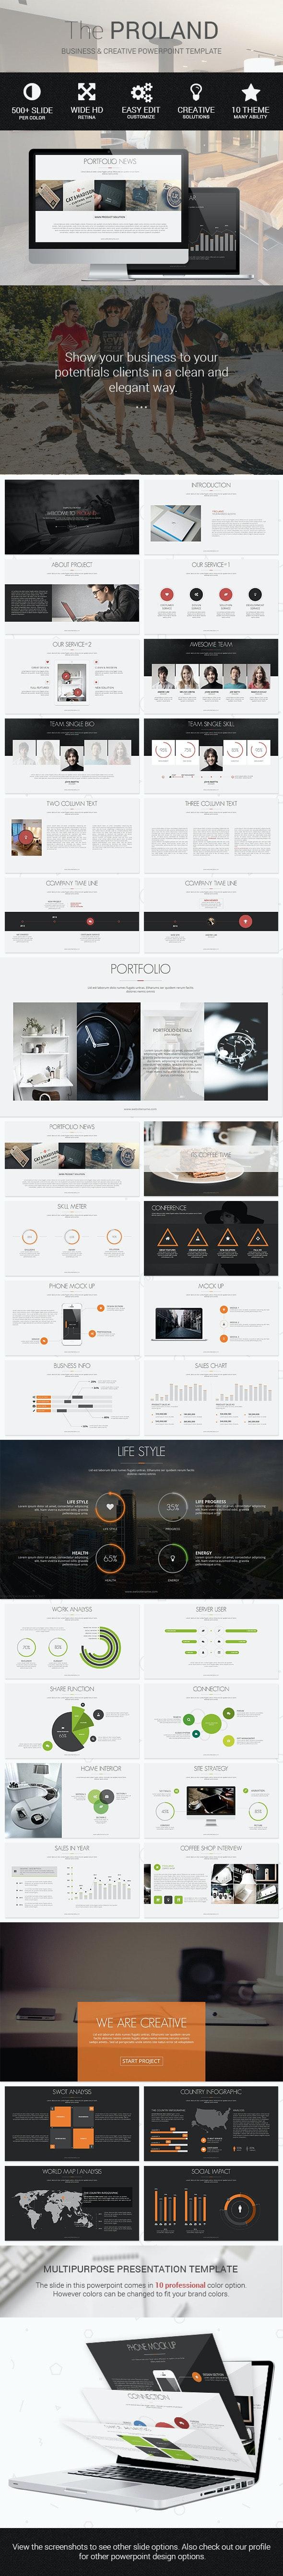 Proland - Powerpoint Multipurpose Template - Business PowerPoint Templates